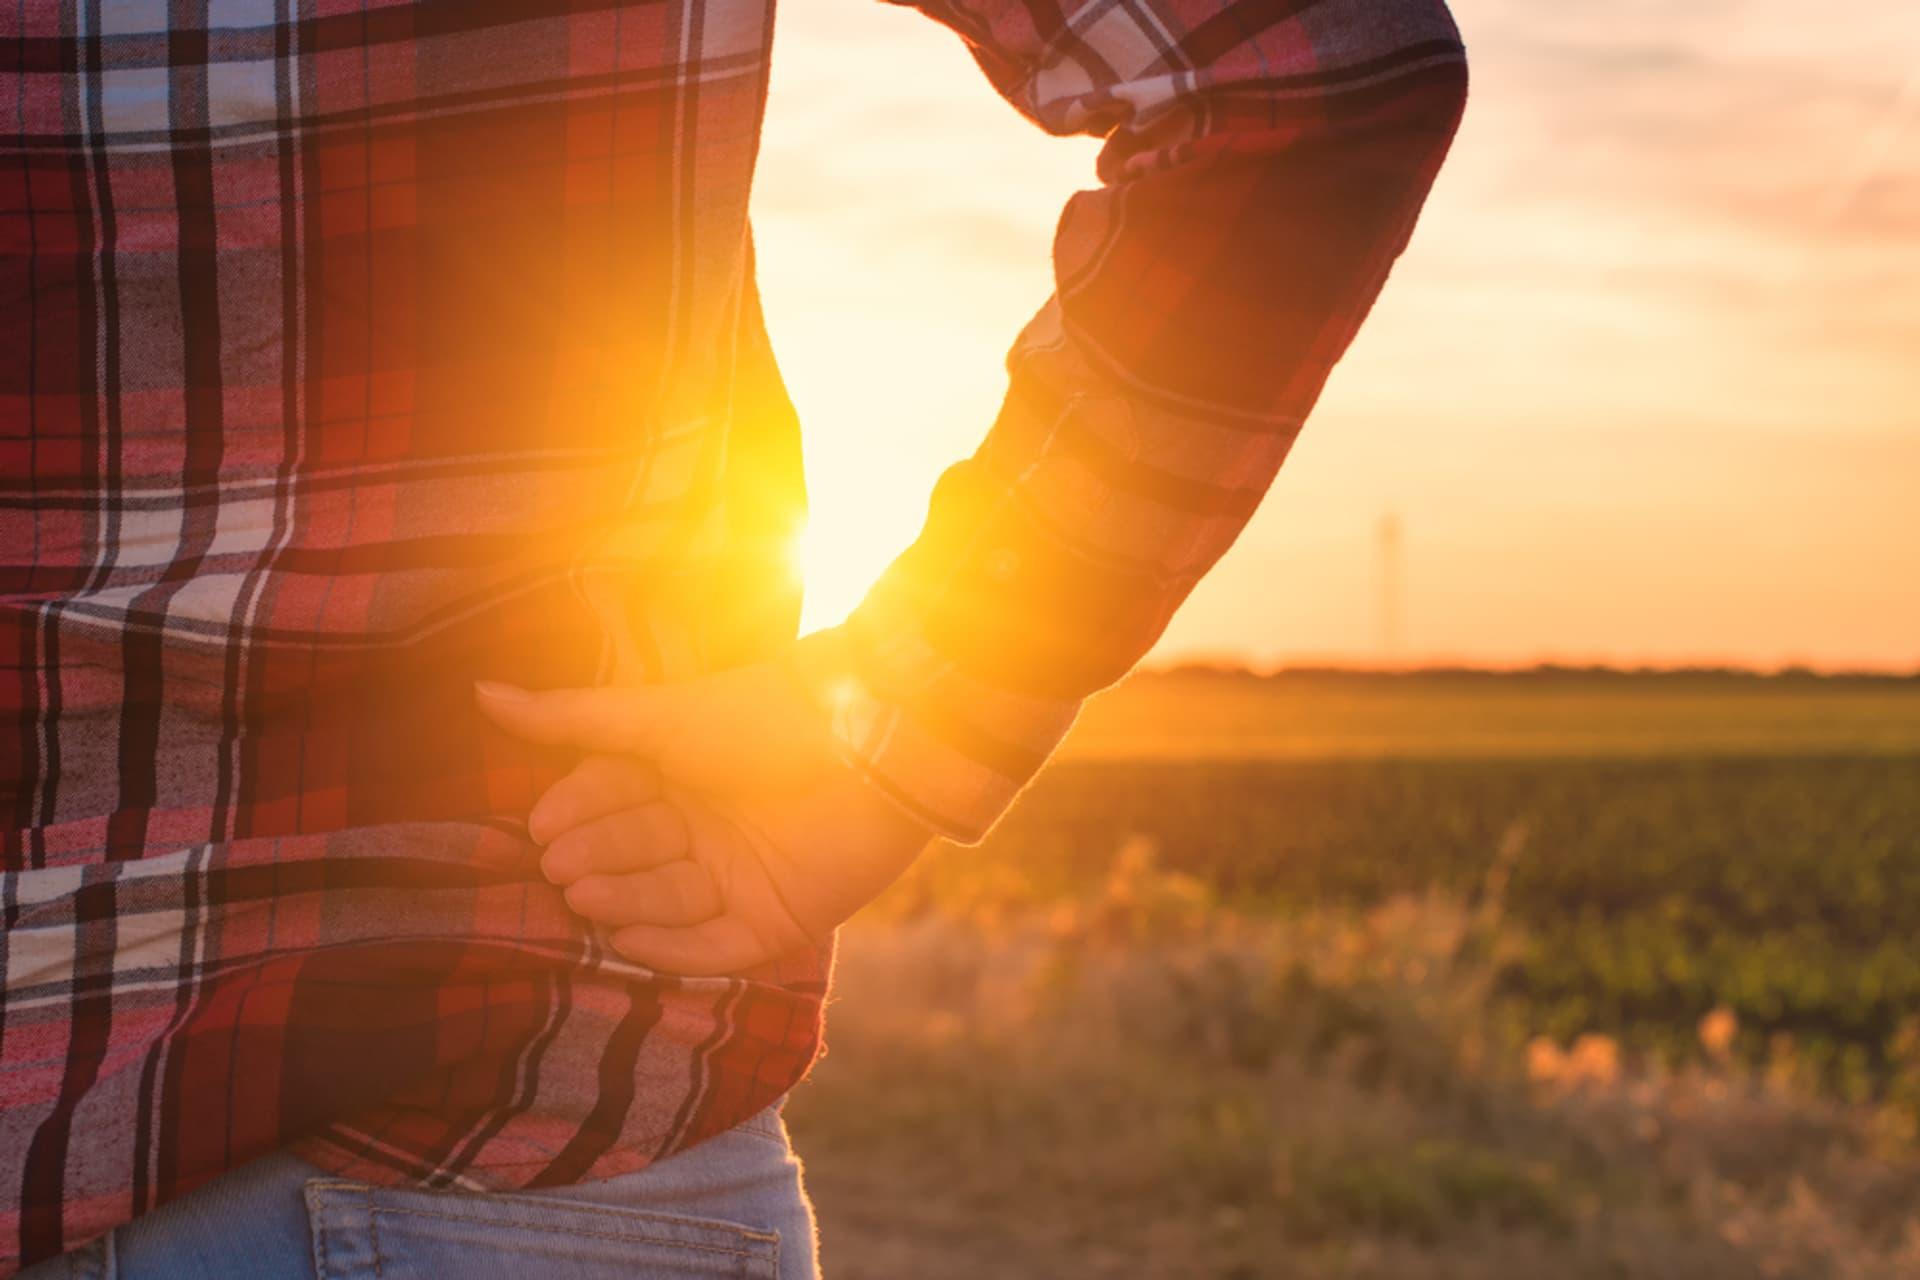 Mensch vor Sonnenuntergang über Feld